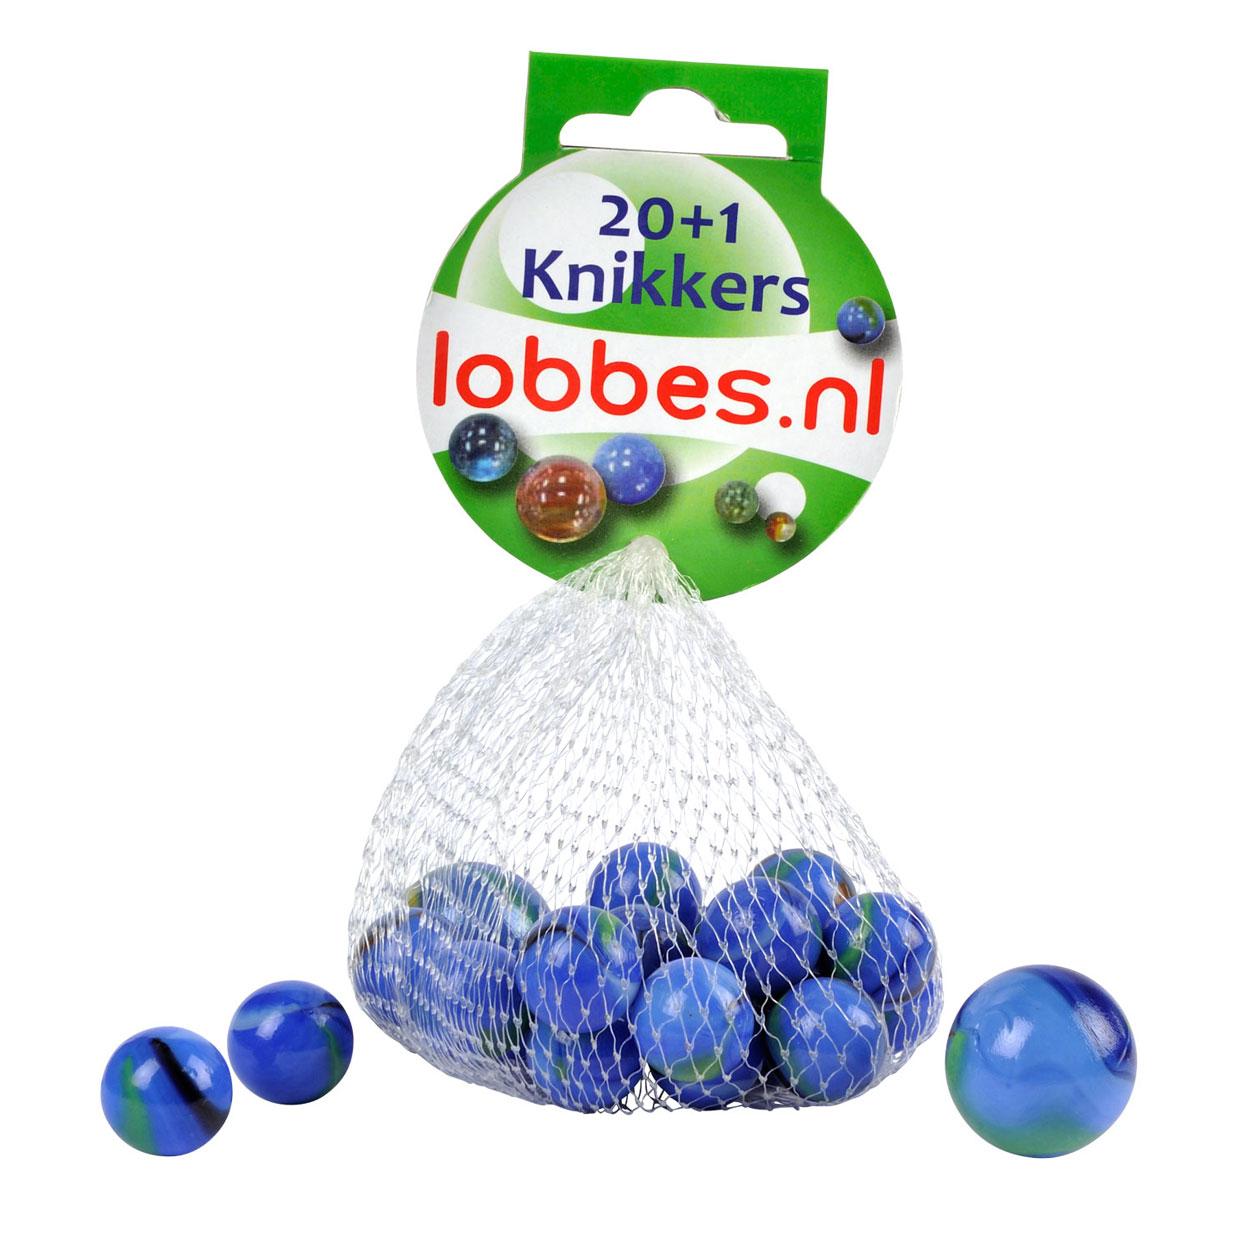 Knikkers kleur blauw 20 1st online kopen - Kleur blauw olie ...